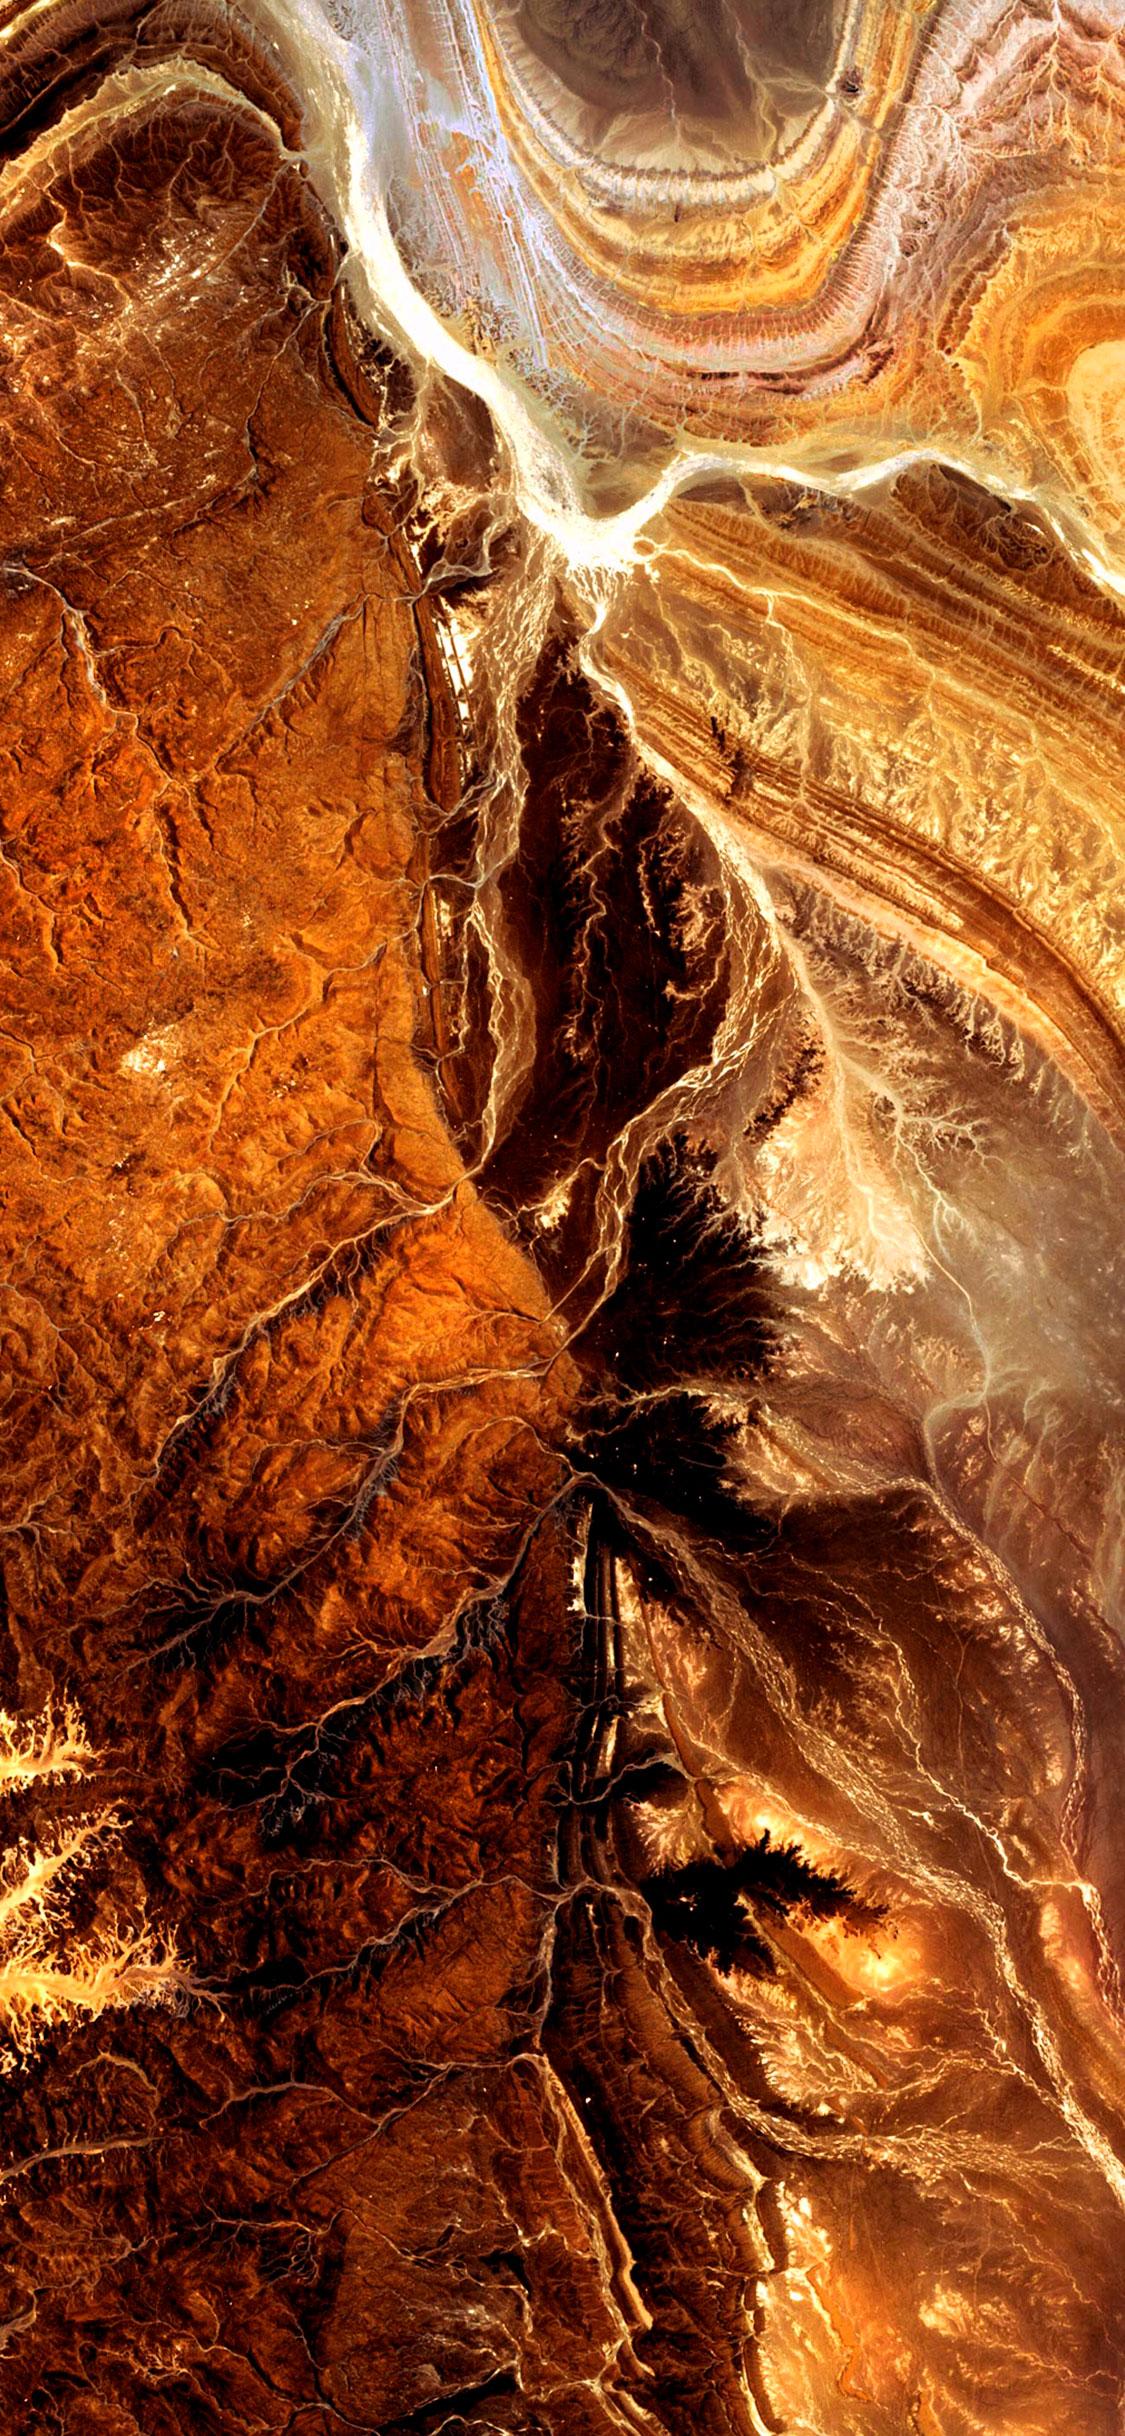 iPhone wallpaper algerian sahara Desert